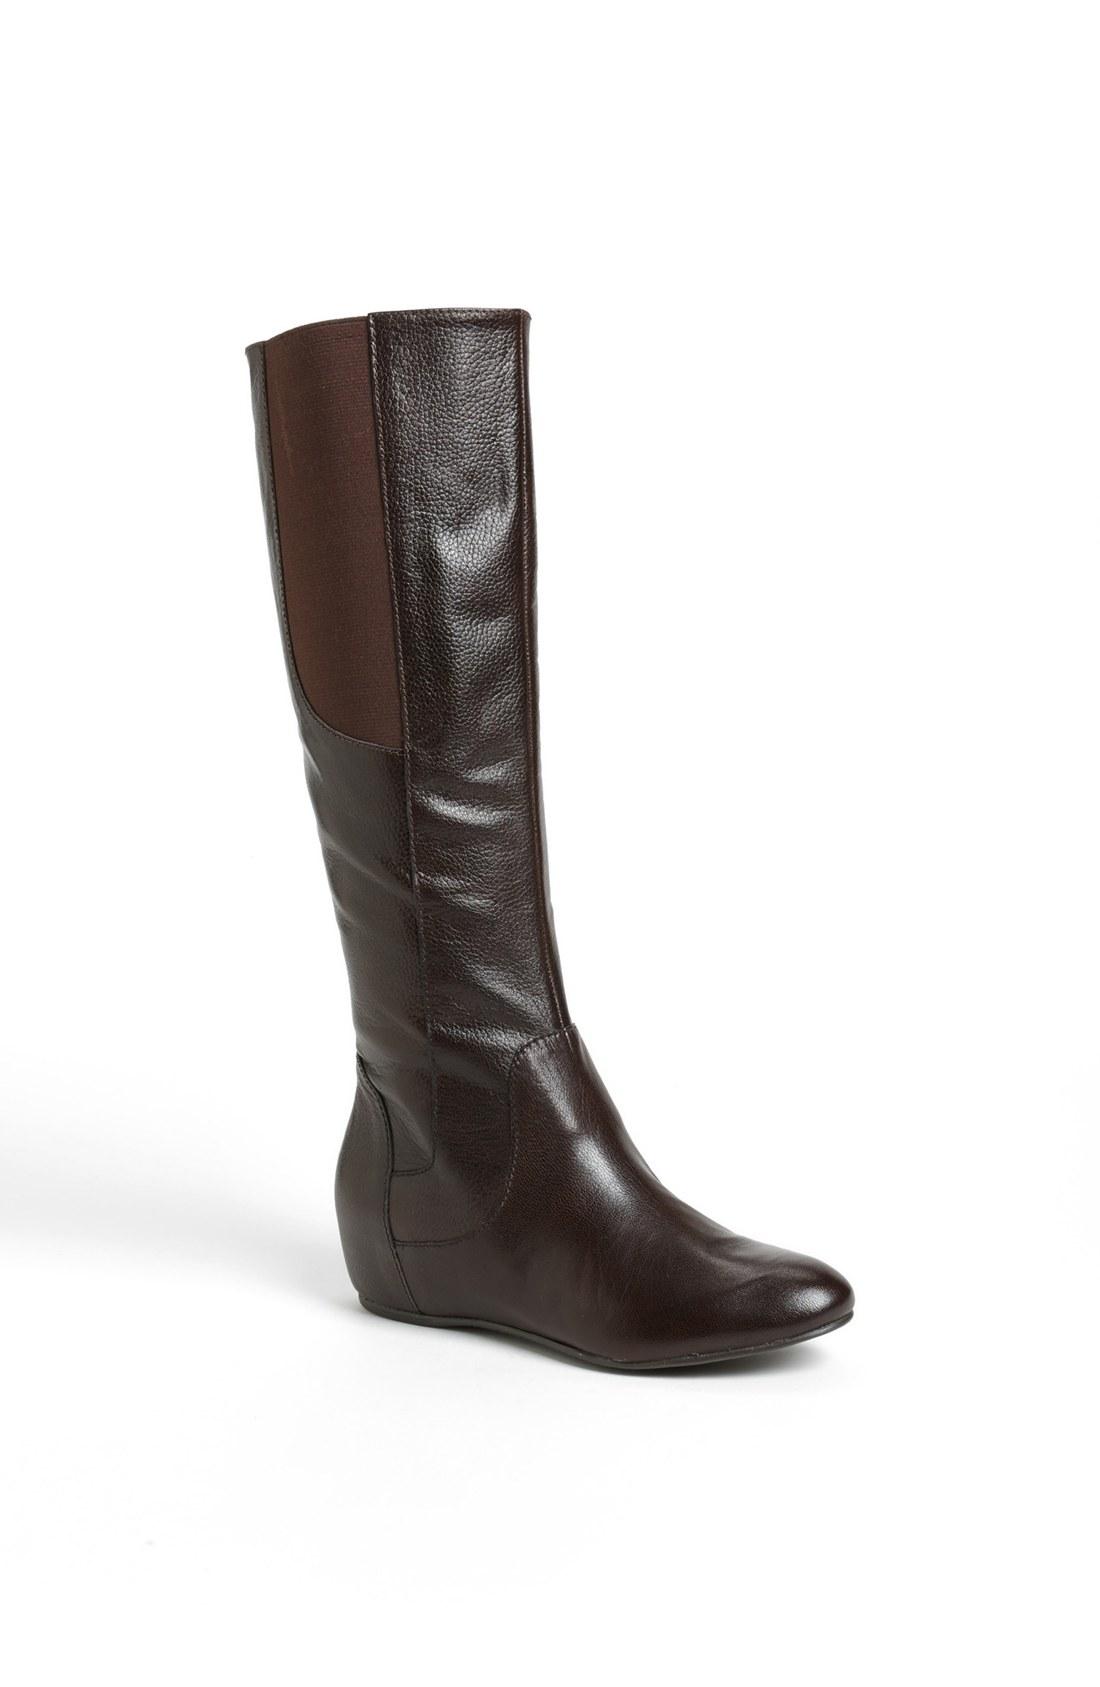 578b3c8dc0b Hidden Wedge Ugg Style Boots